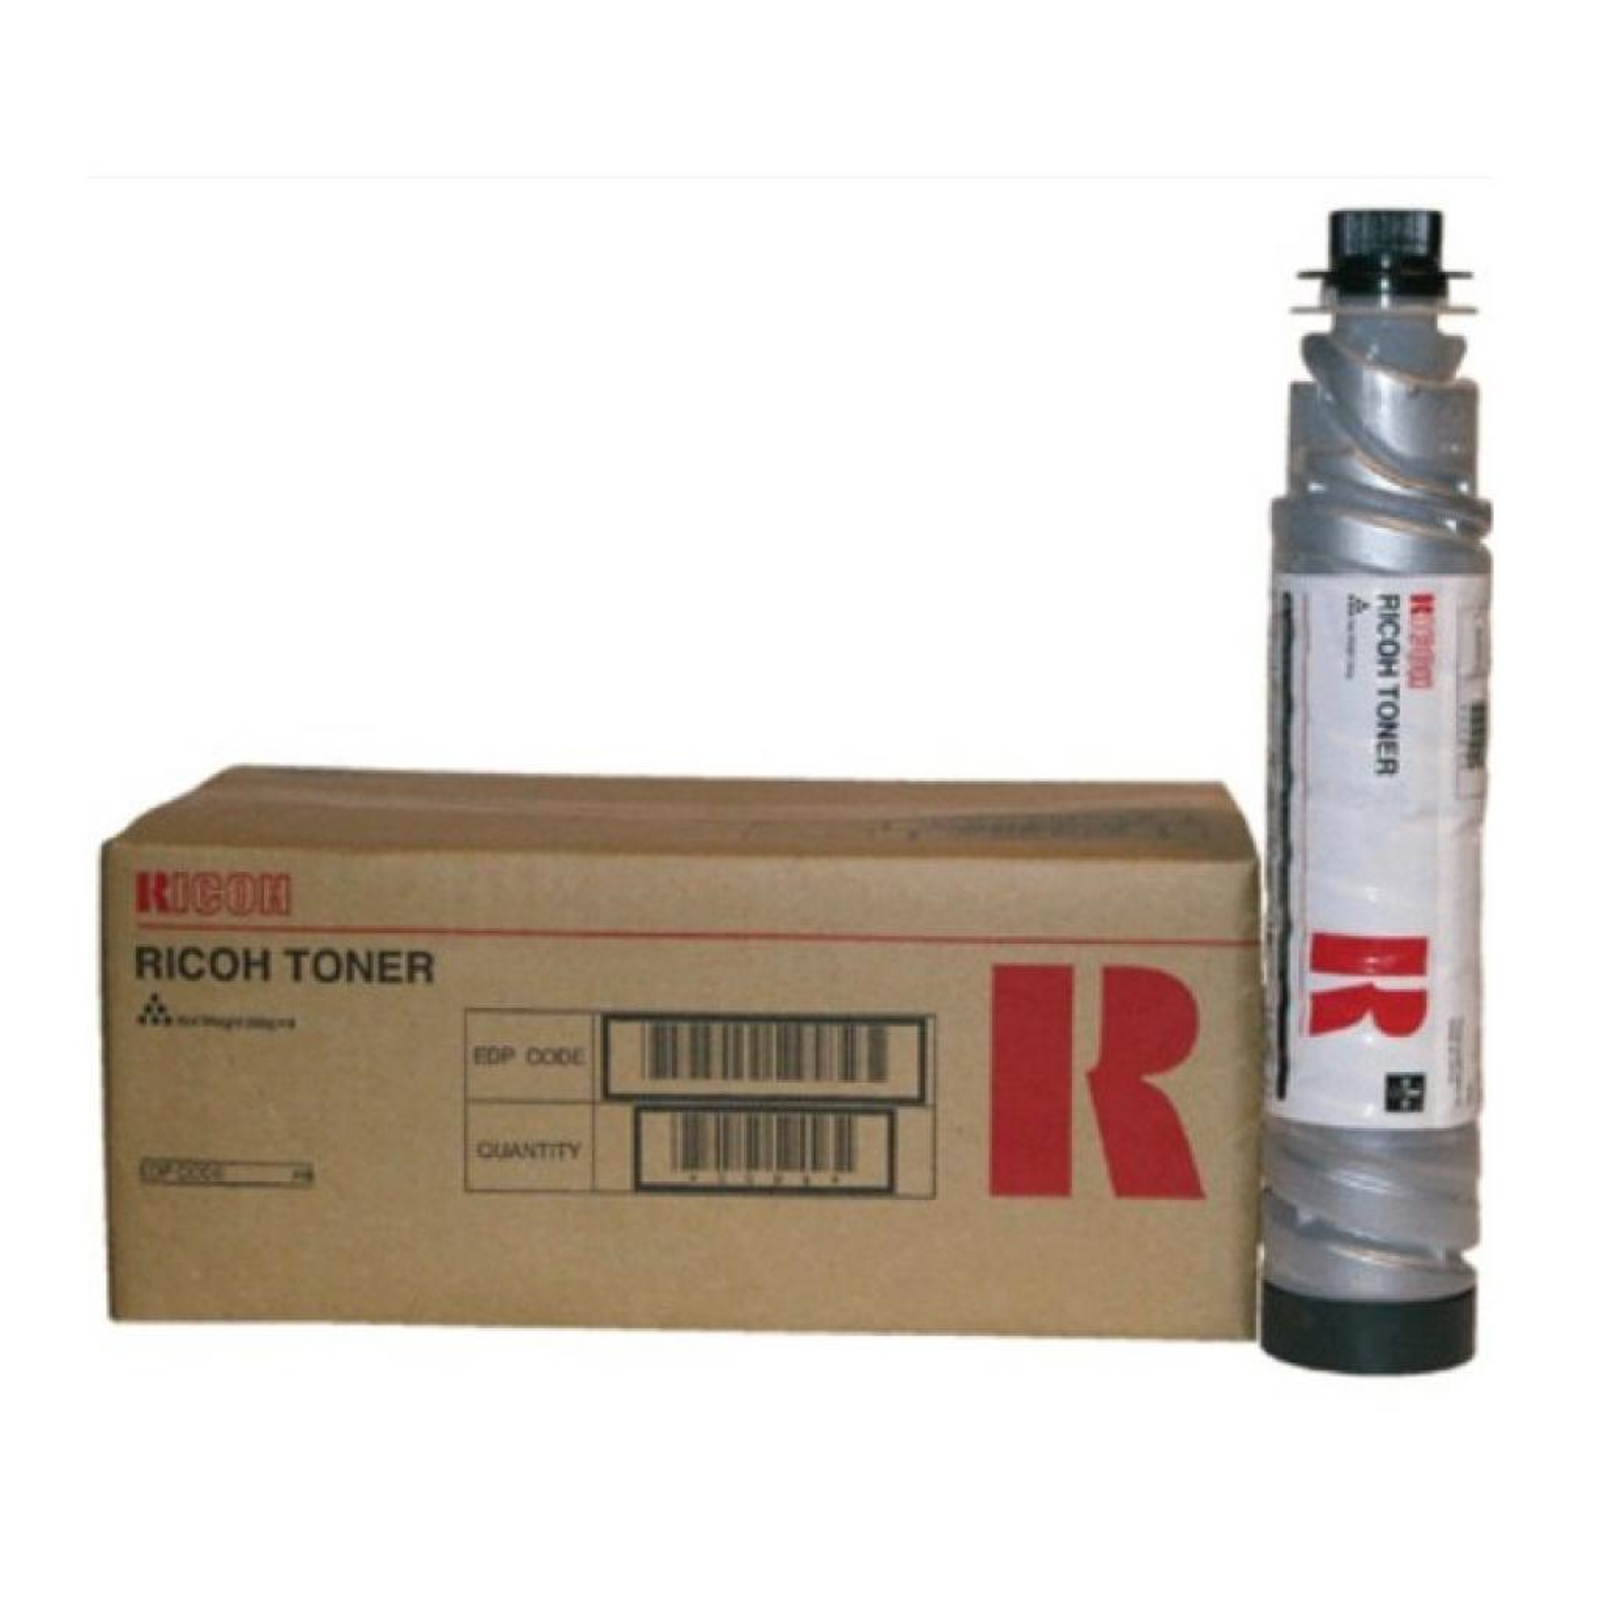 Тонер-картридж Ricoh TOMP4500EFR2 Black 30К (MP3500/MP4000/MP4500/MP5000/MP4001) (841347)